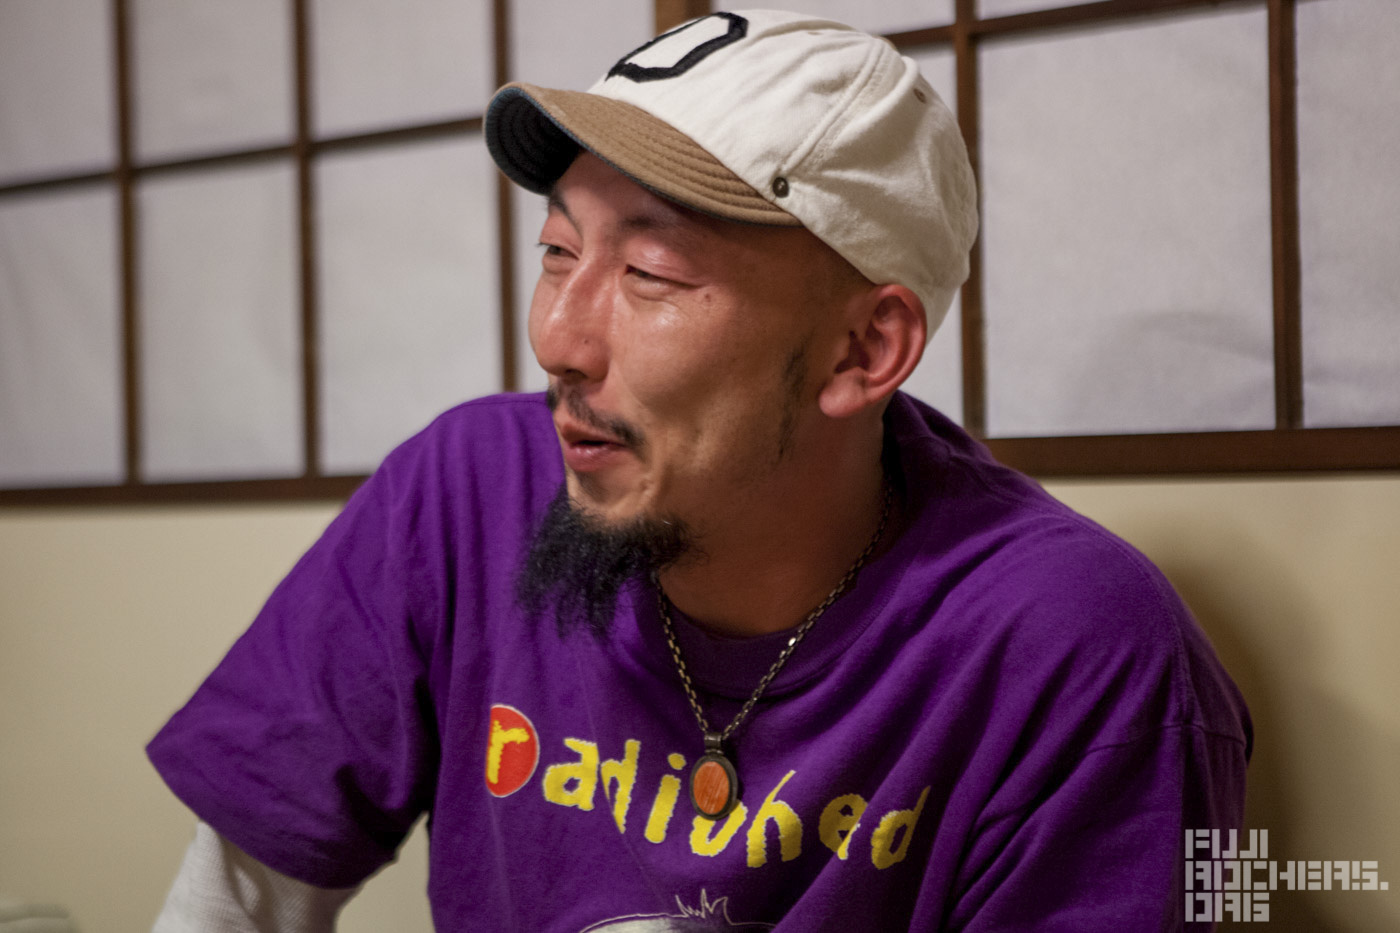 Photo by アリモトシンヤ